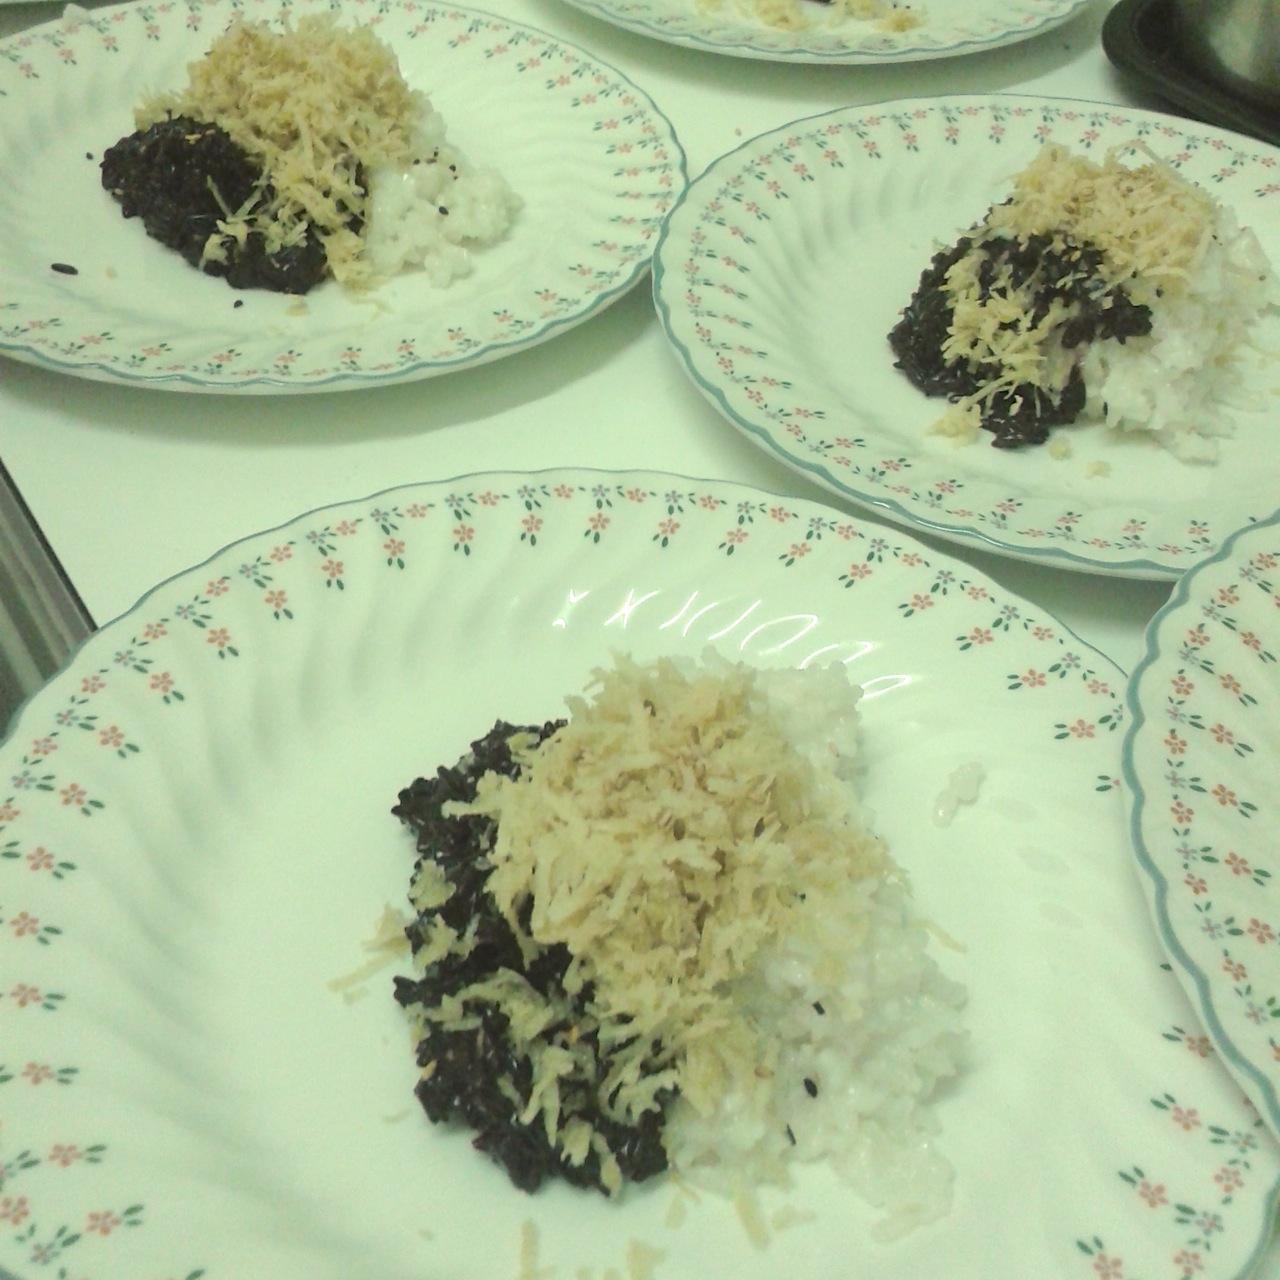 https://i0.wp.com/fatgayvegan.com/wp-content/uploads/2014/04/sticky-rice.jpg?fit=1280%2C1280